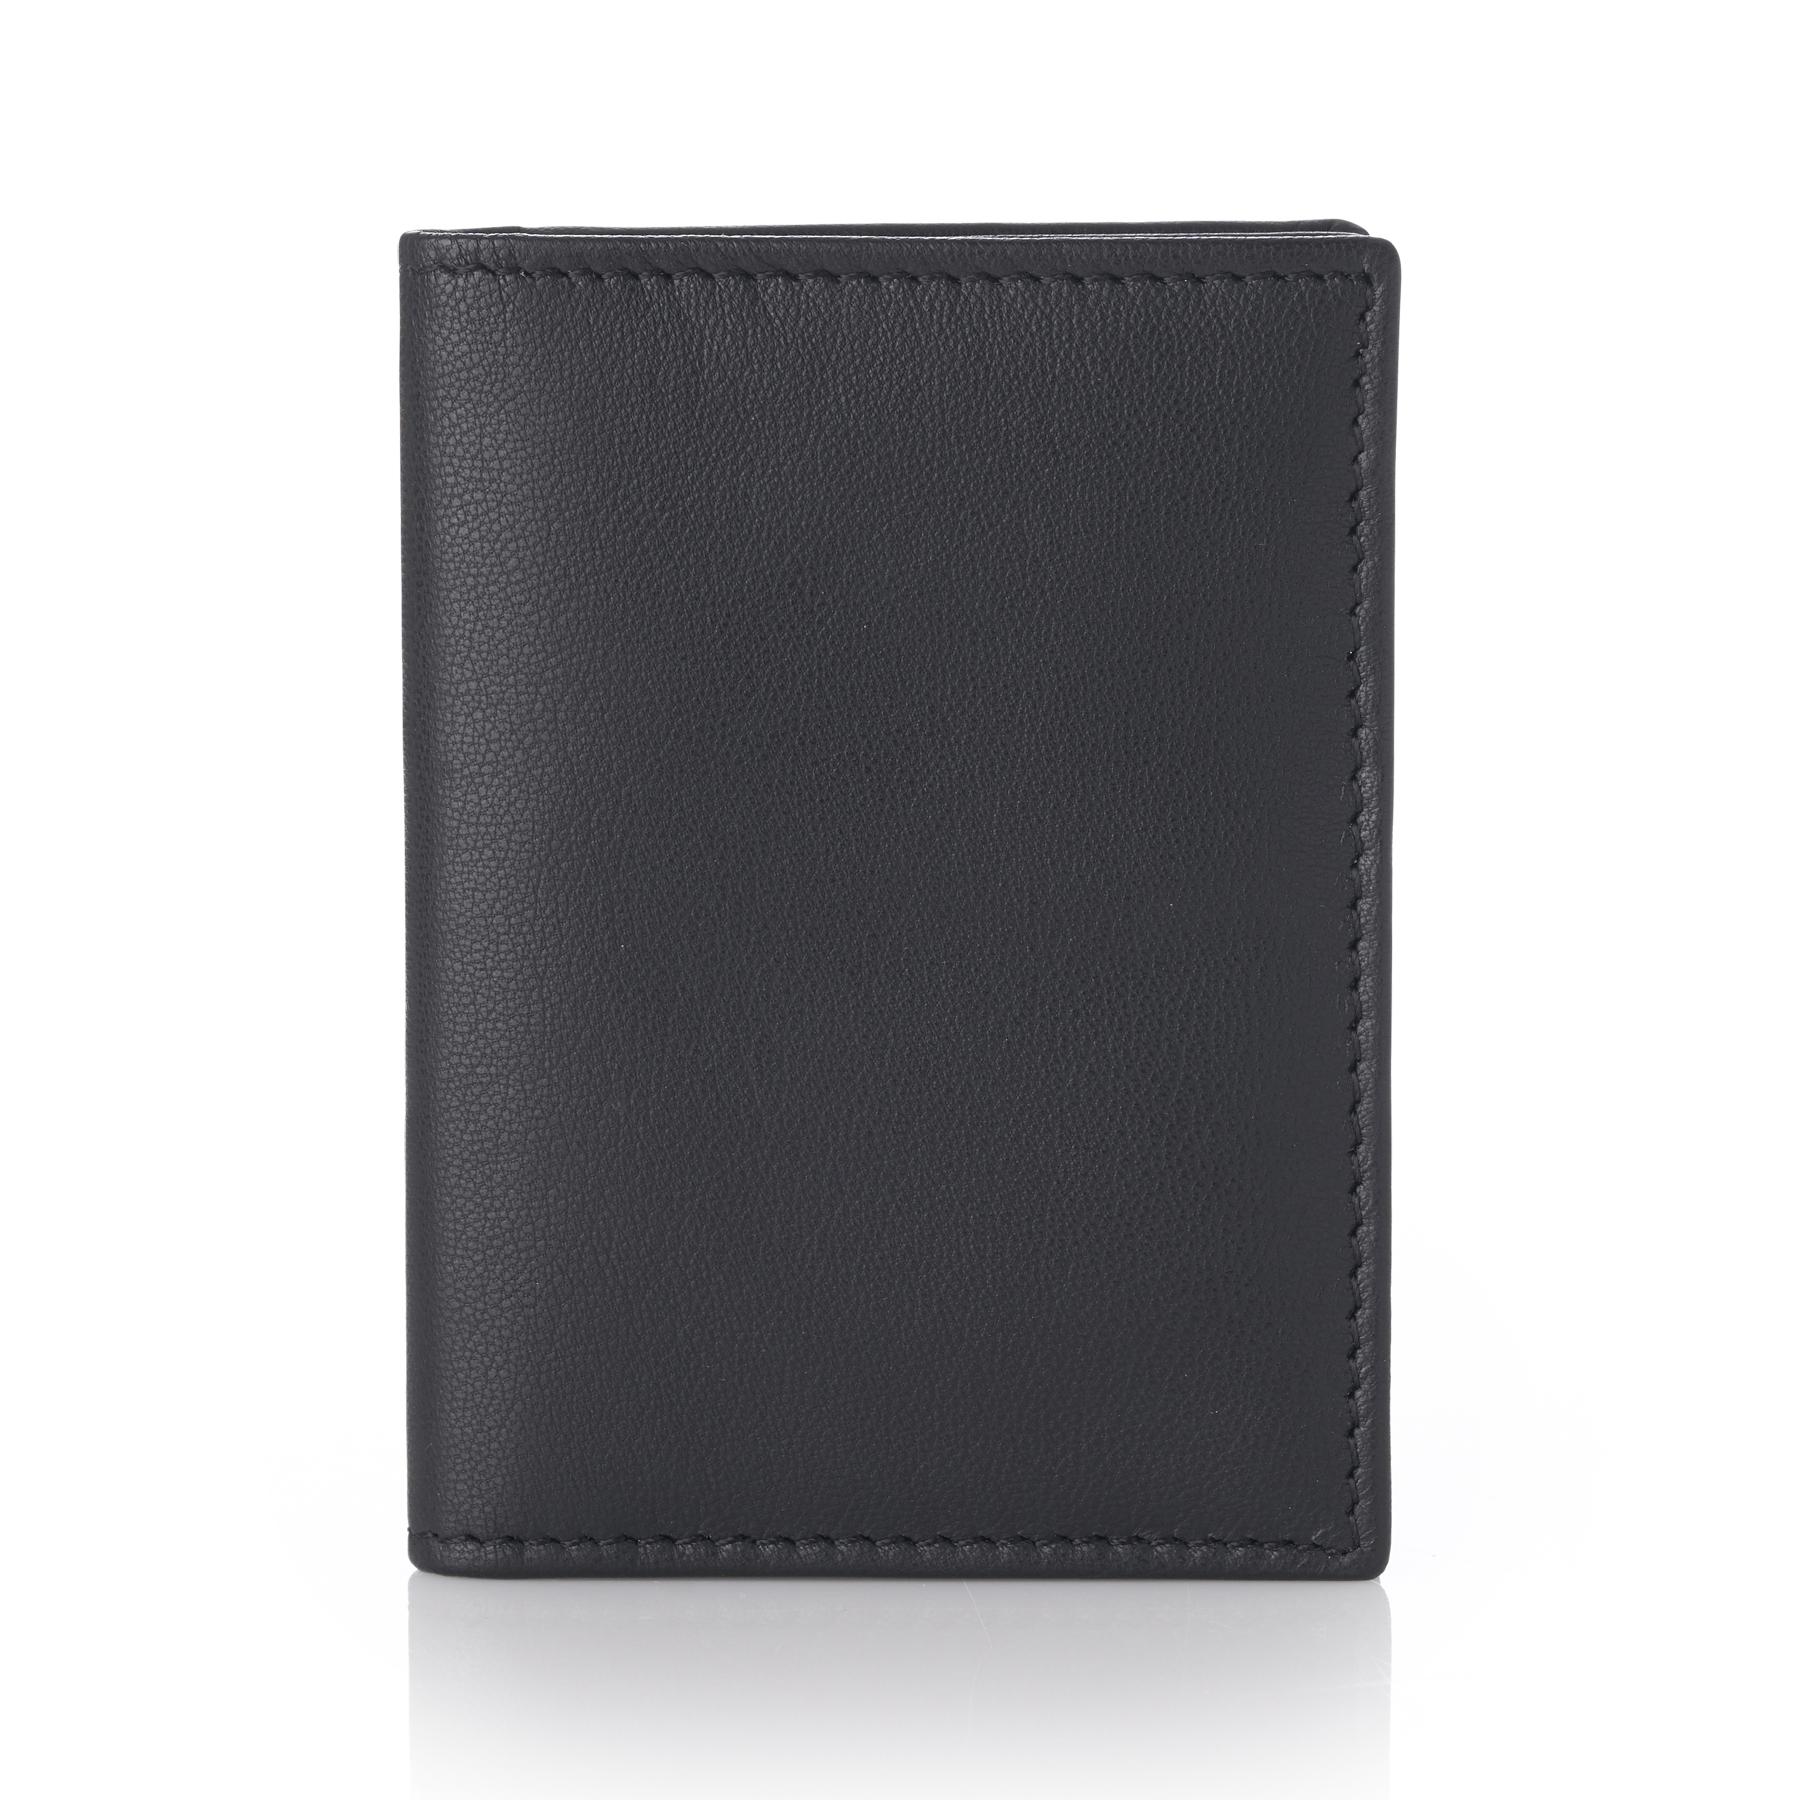 Alpine-Swiss-RFID-Leather-Business-Card-Wallet-Minimalist-ID-Window-Card-Holder thumbnail 13